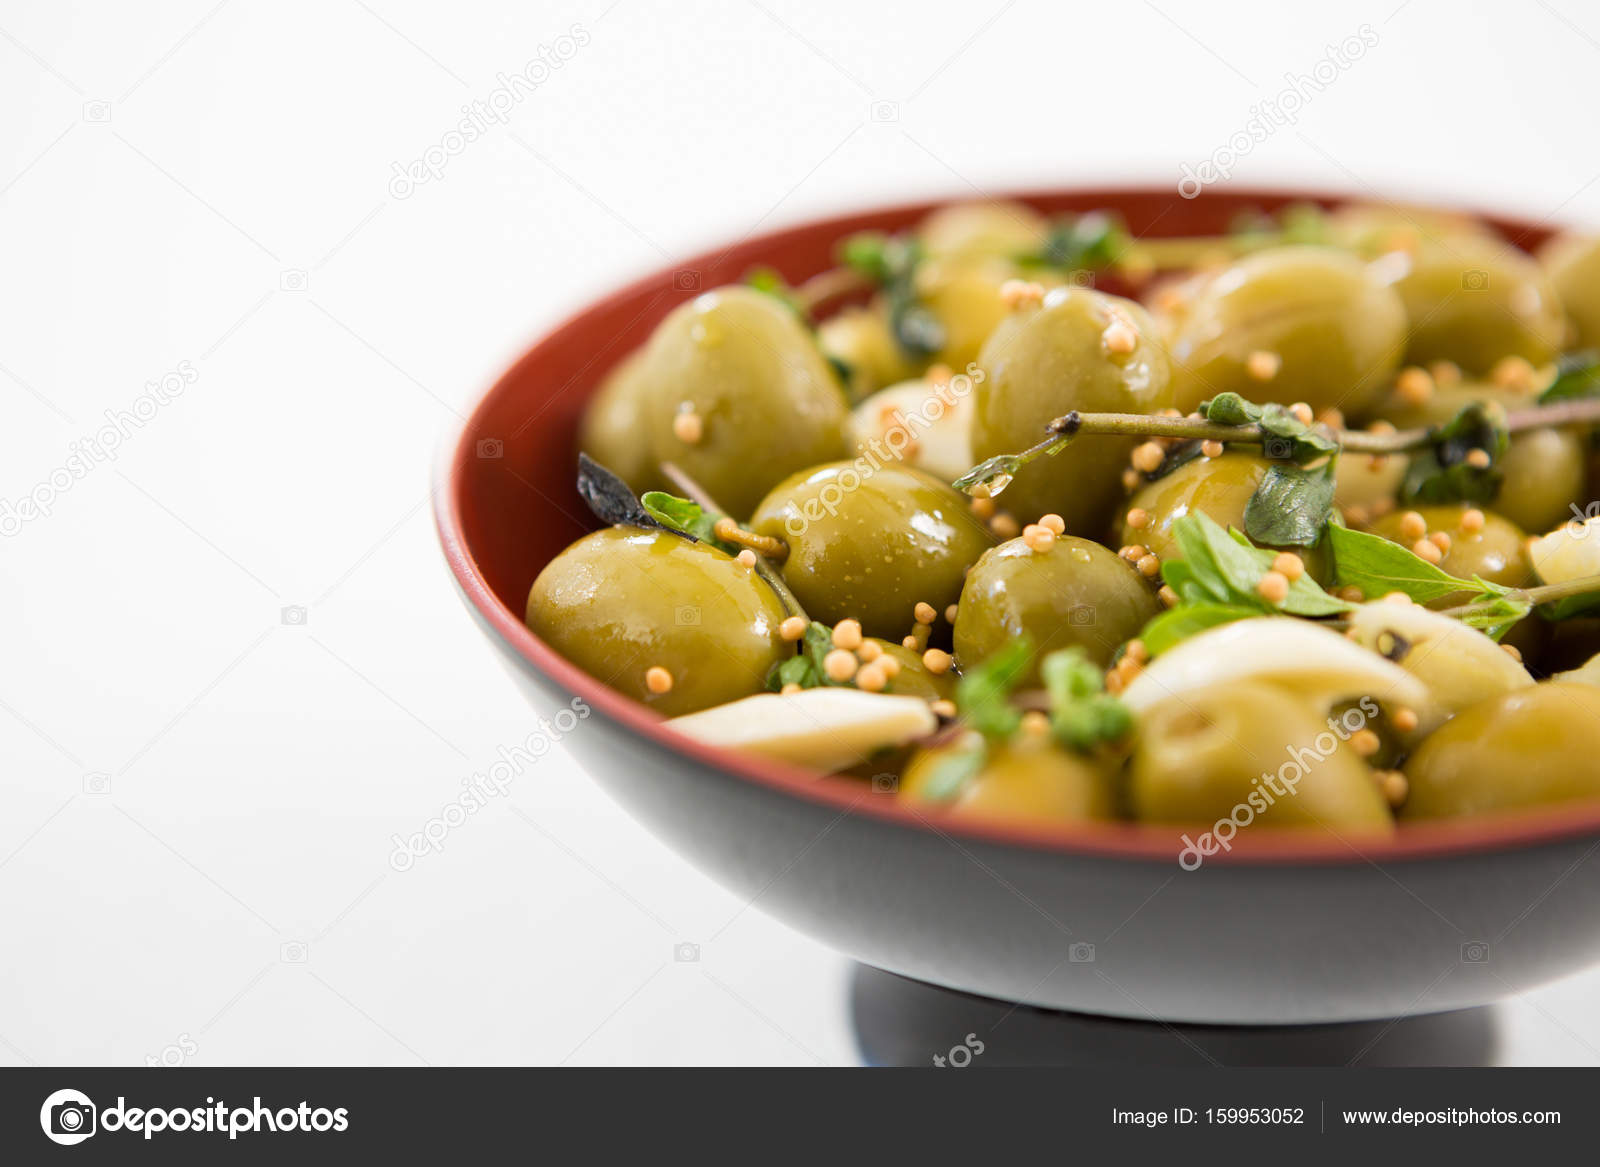 how to make garlic marinated olives